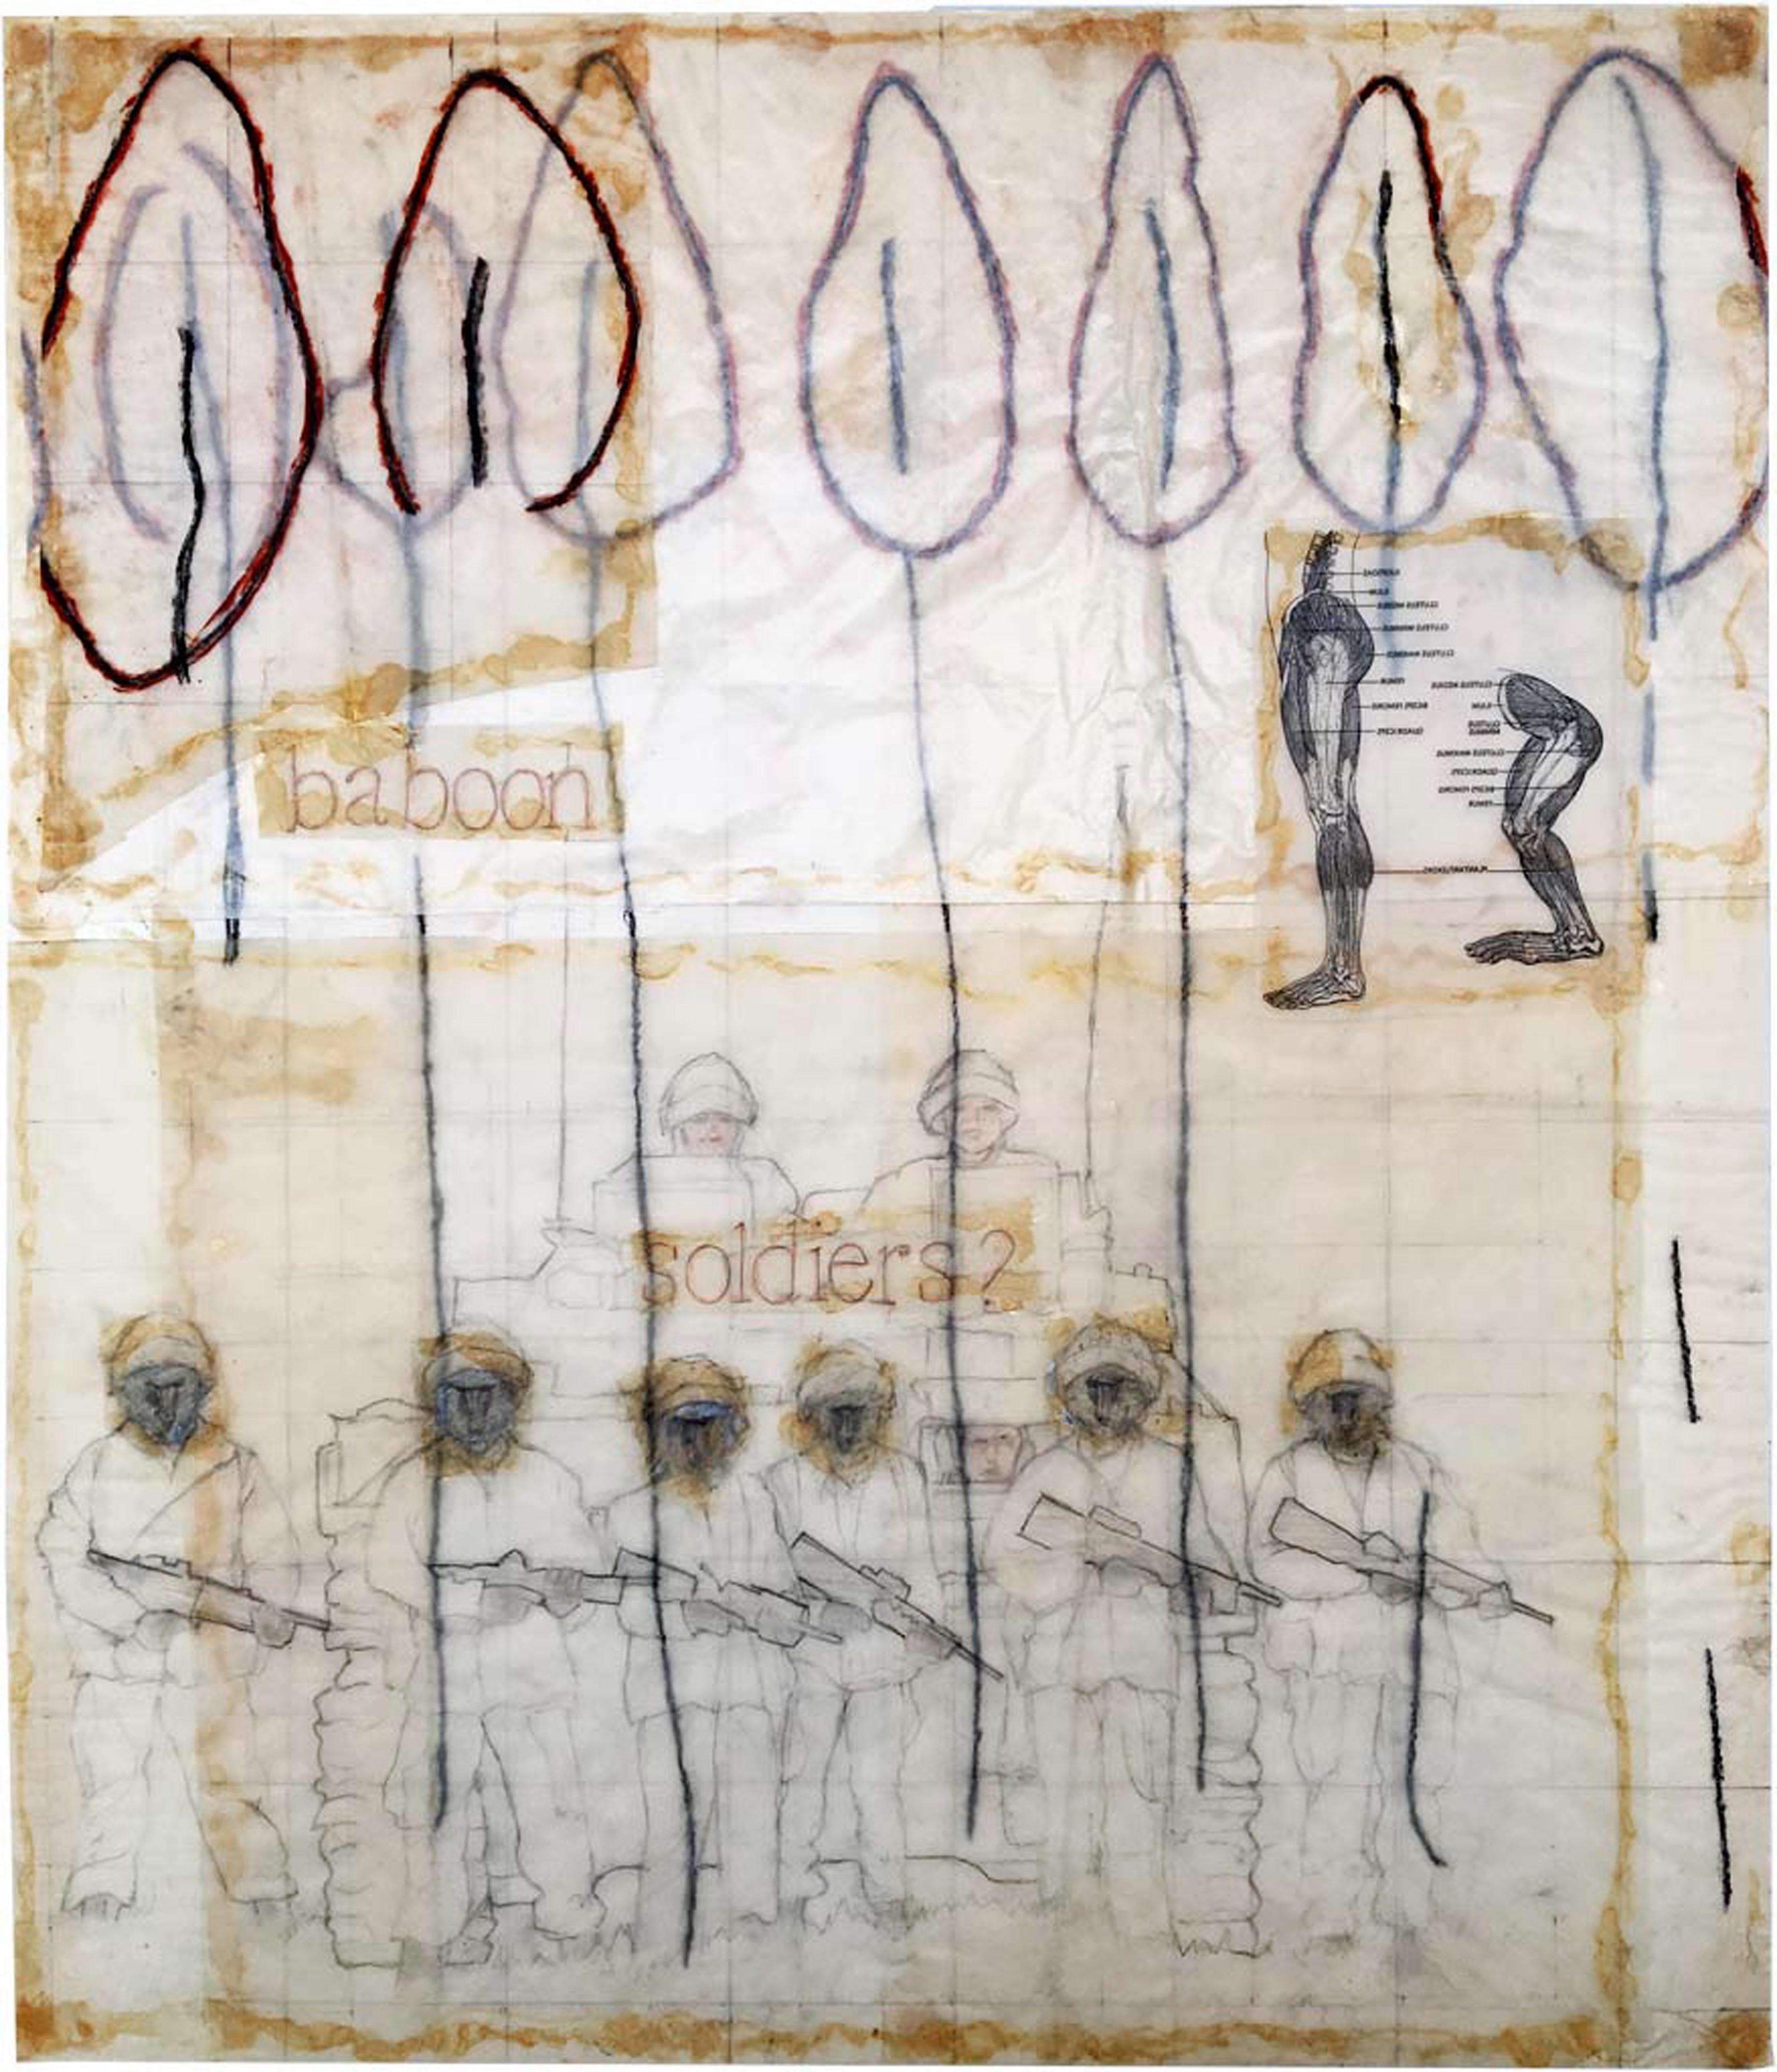 Galerie Barbara Thumm \ ZWANZIG anniversary exhibition 20 years Galerie Barbara Thumm \ baboon soldiers? (1990)